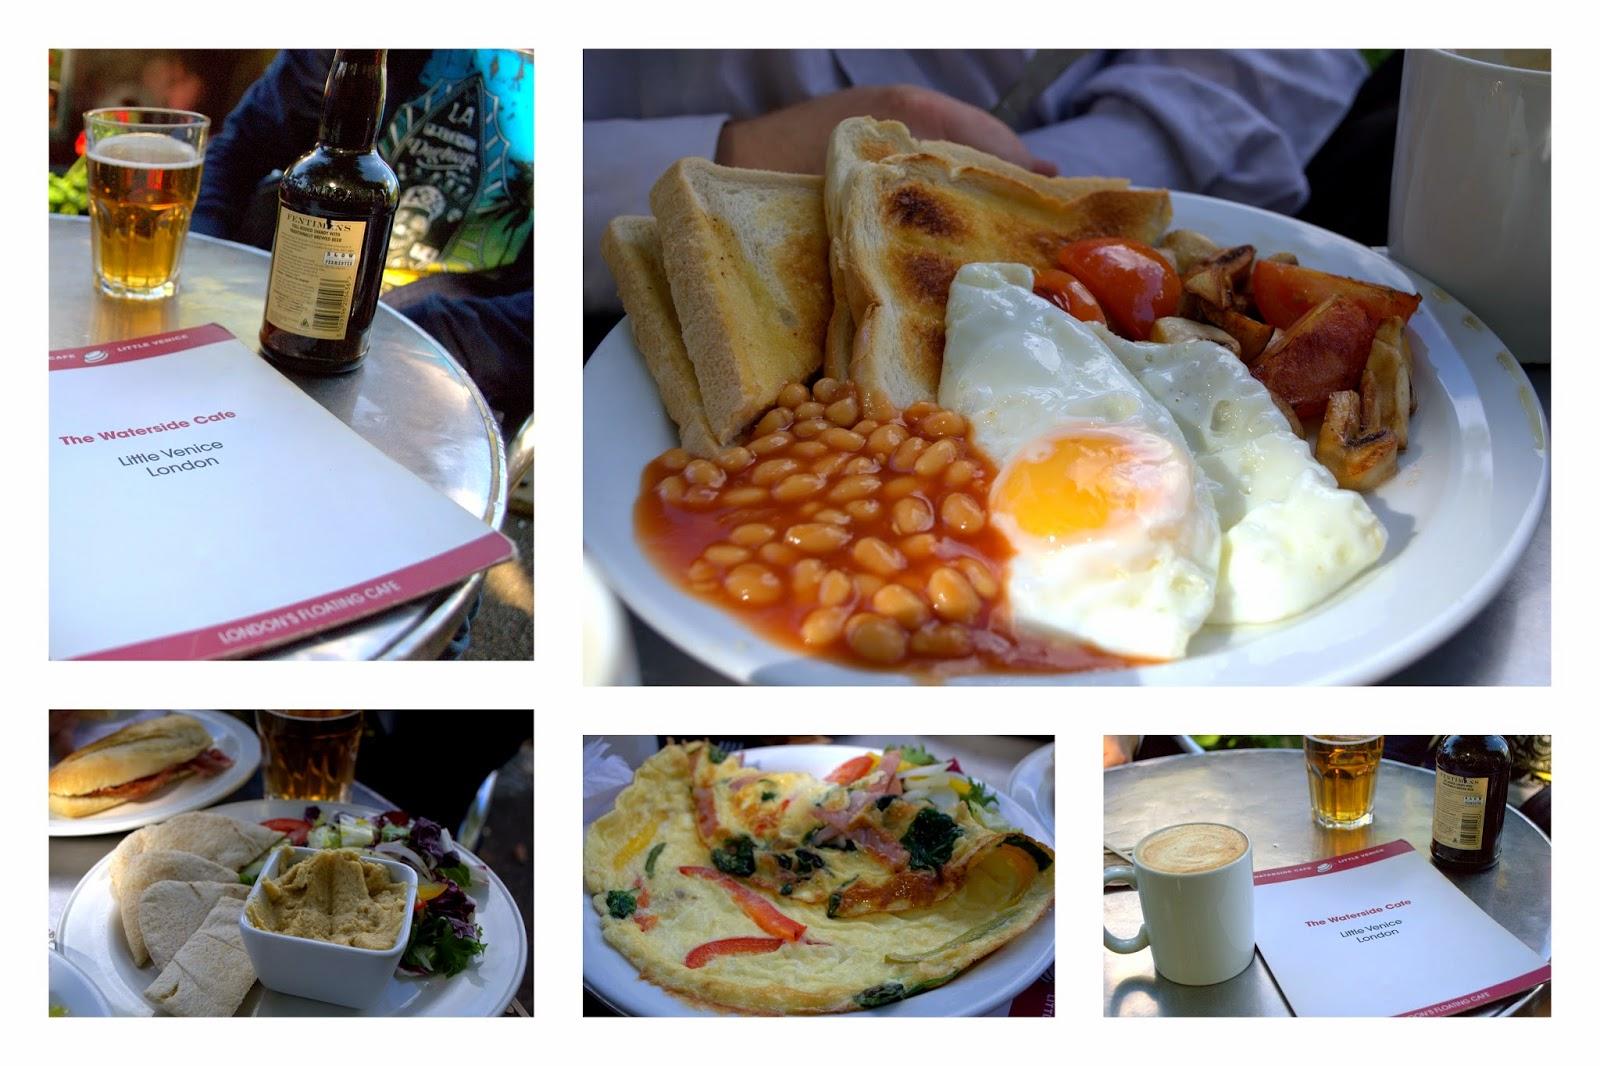 Food at Waterside Cafe Little Venice London Warrick Avenue Paddington | Quick Guide To London's Little Venice | Canals, Boat Trips, Restaurants & Tours